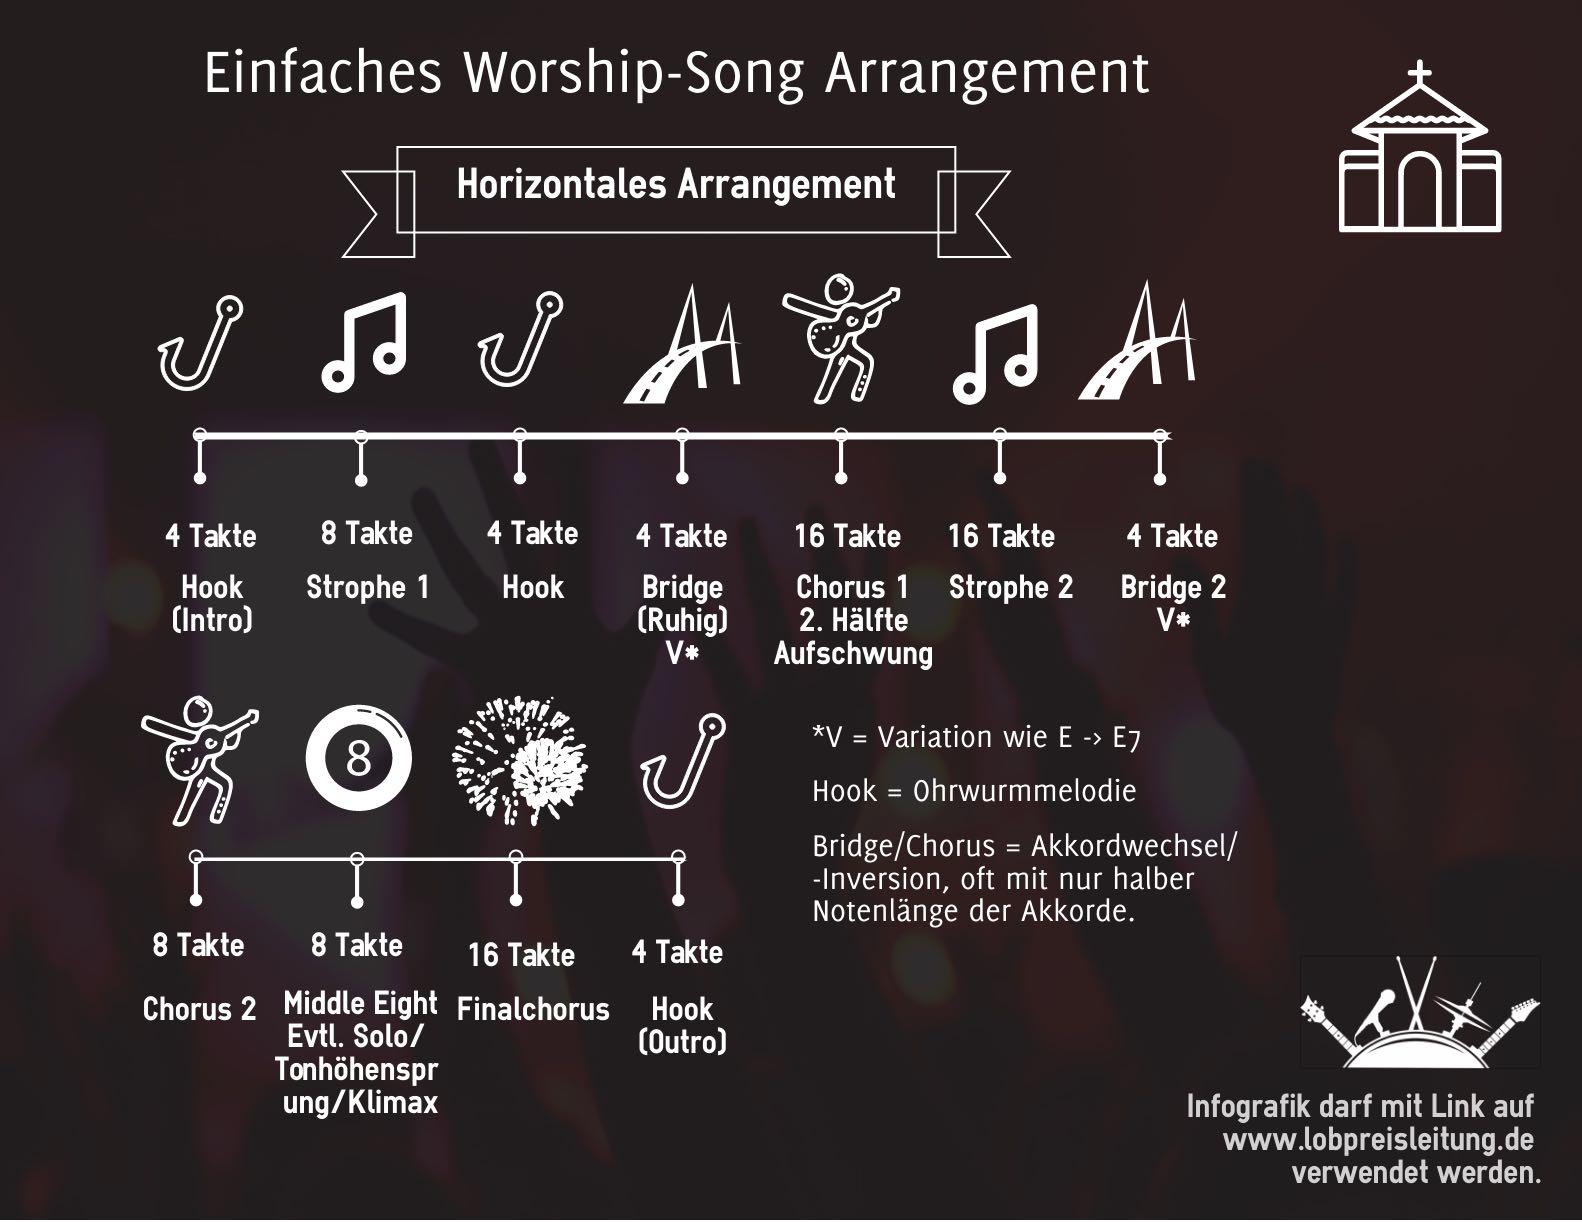 Horizontales Worship und Pop Song Arrangement Infografik